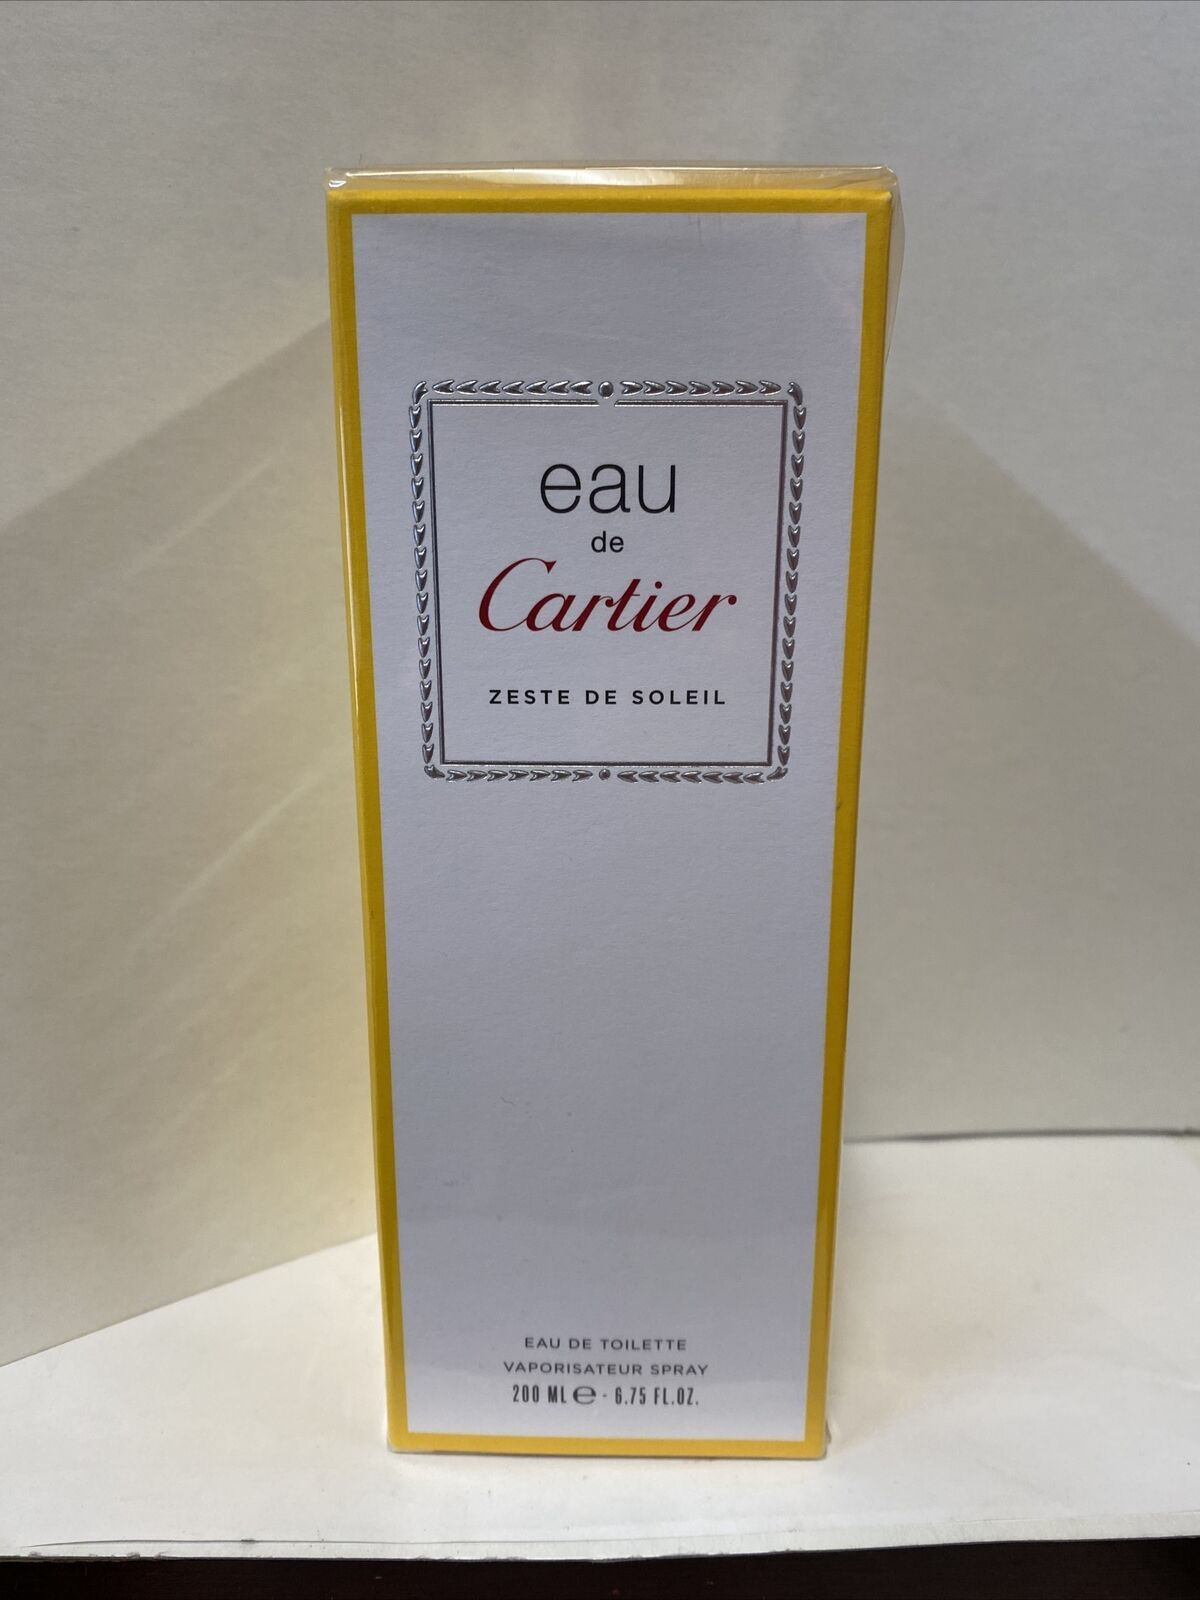 Cartier eau de cartier zeste soleil  6.7 oz edp spray